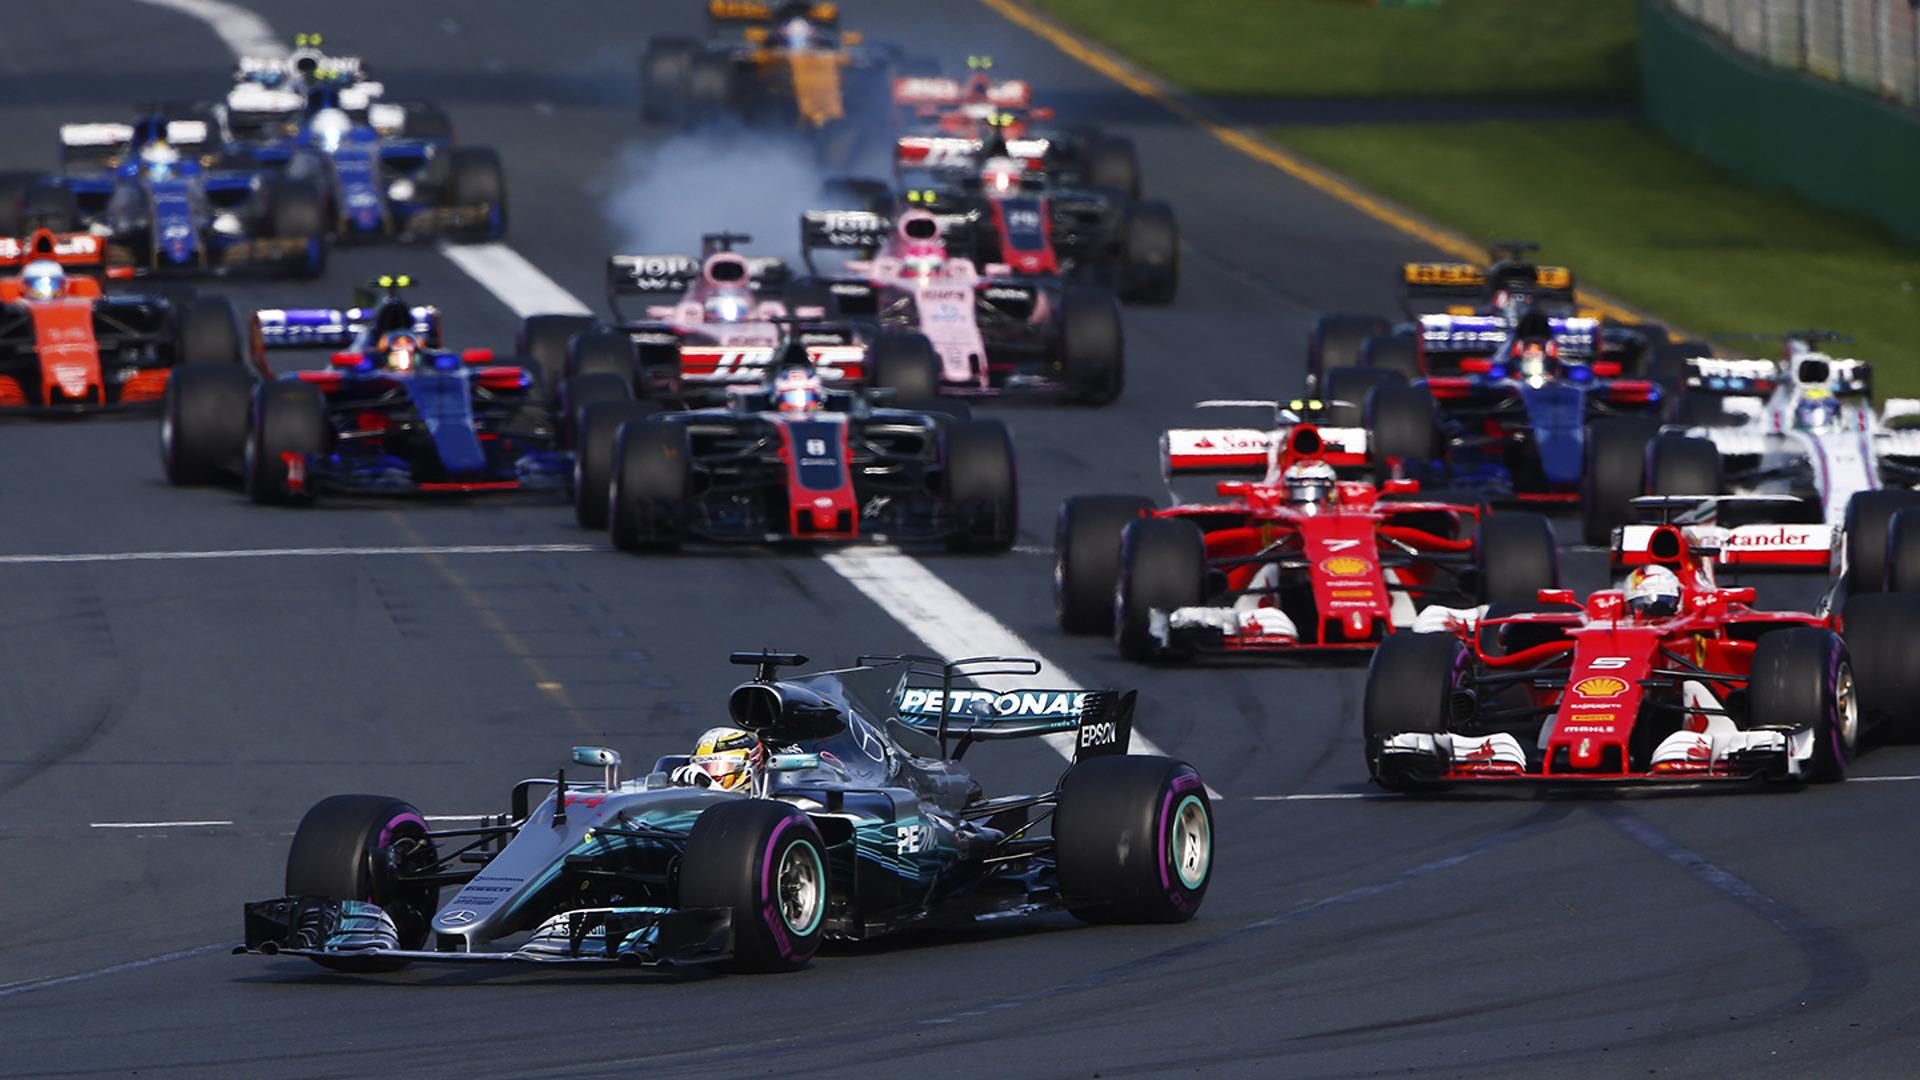 2017 F1 Australian Grand Prix